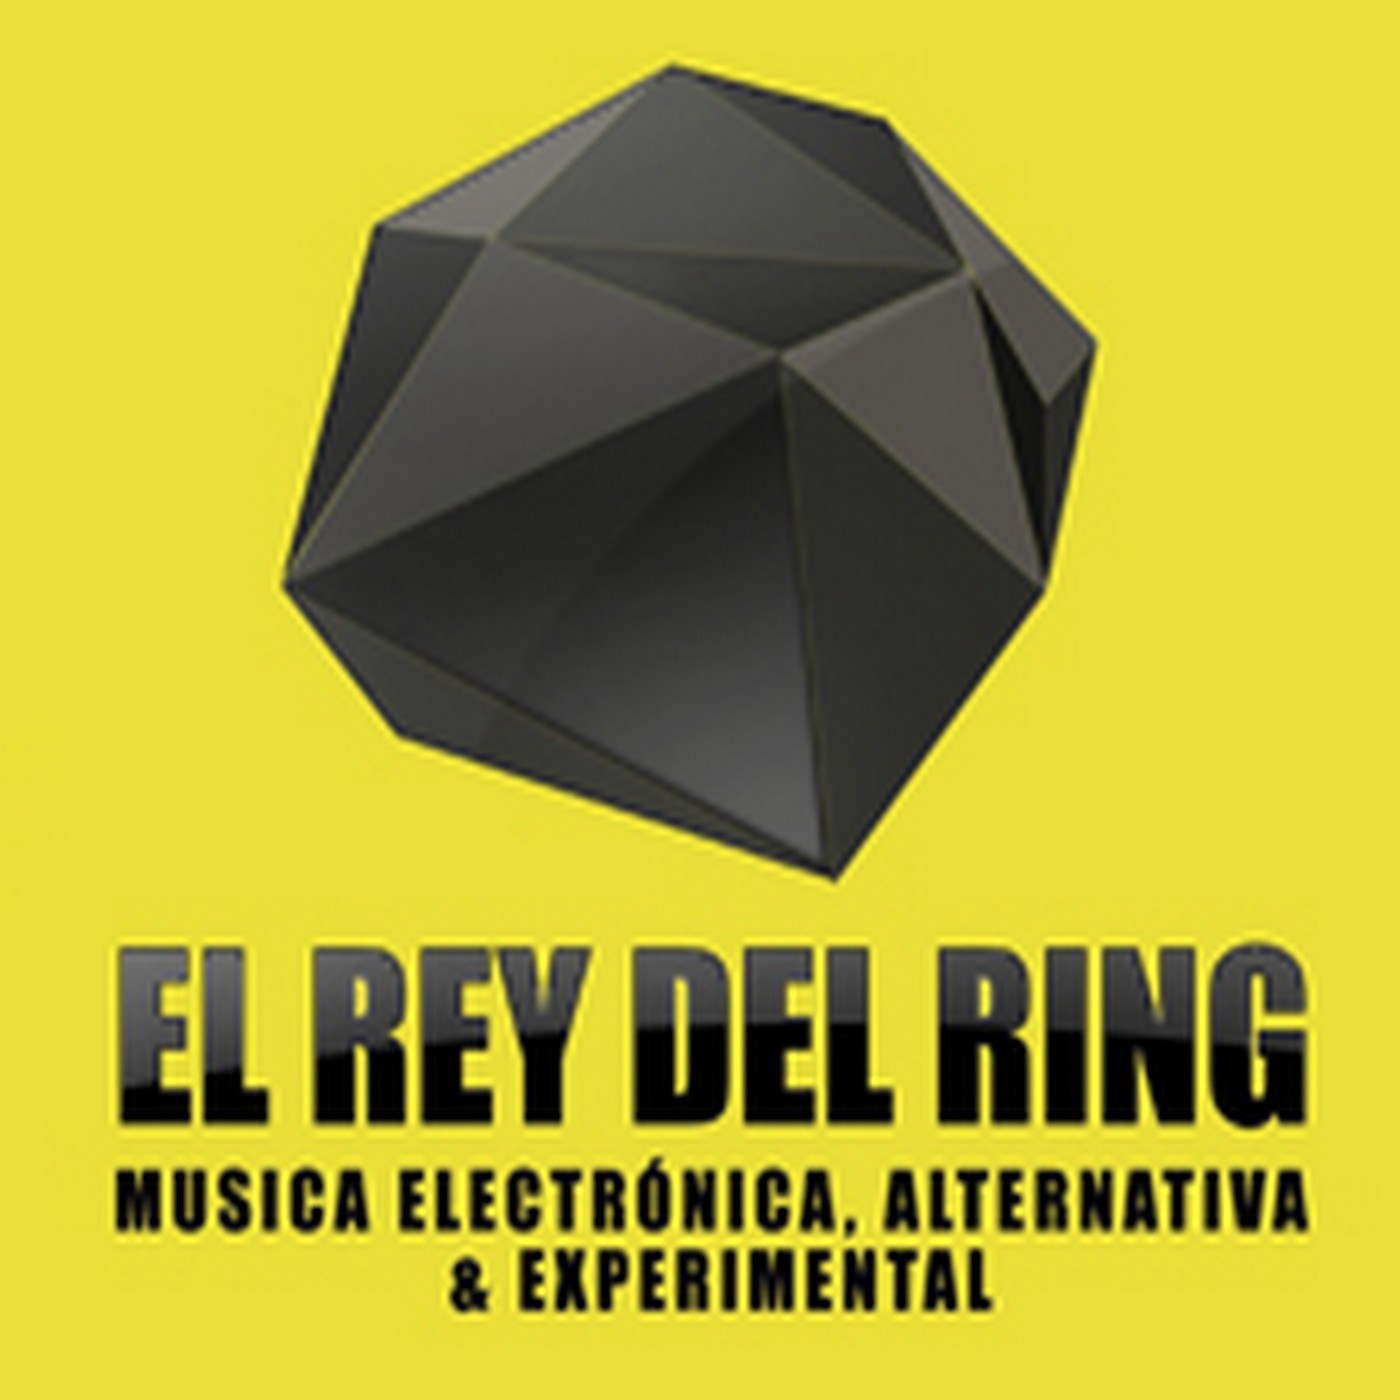 Rey del ring – Eguzki irratia